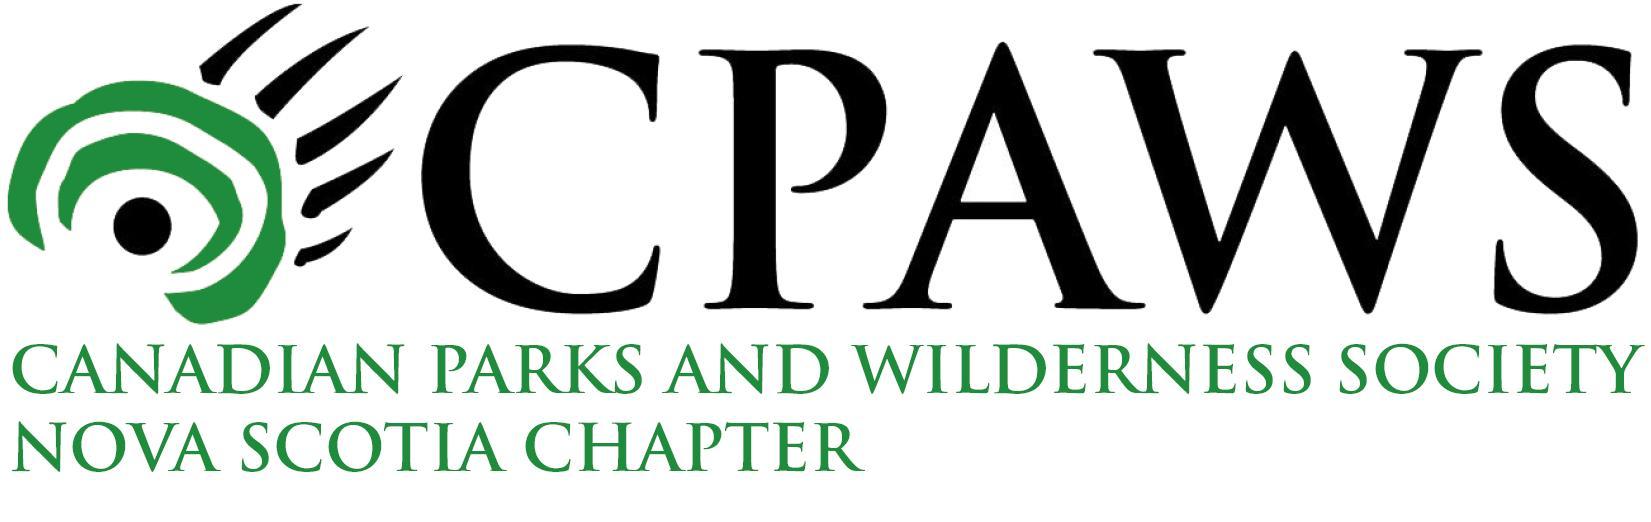 CPAWS CPAWS Nova Scotia